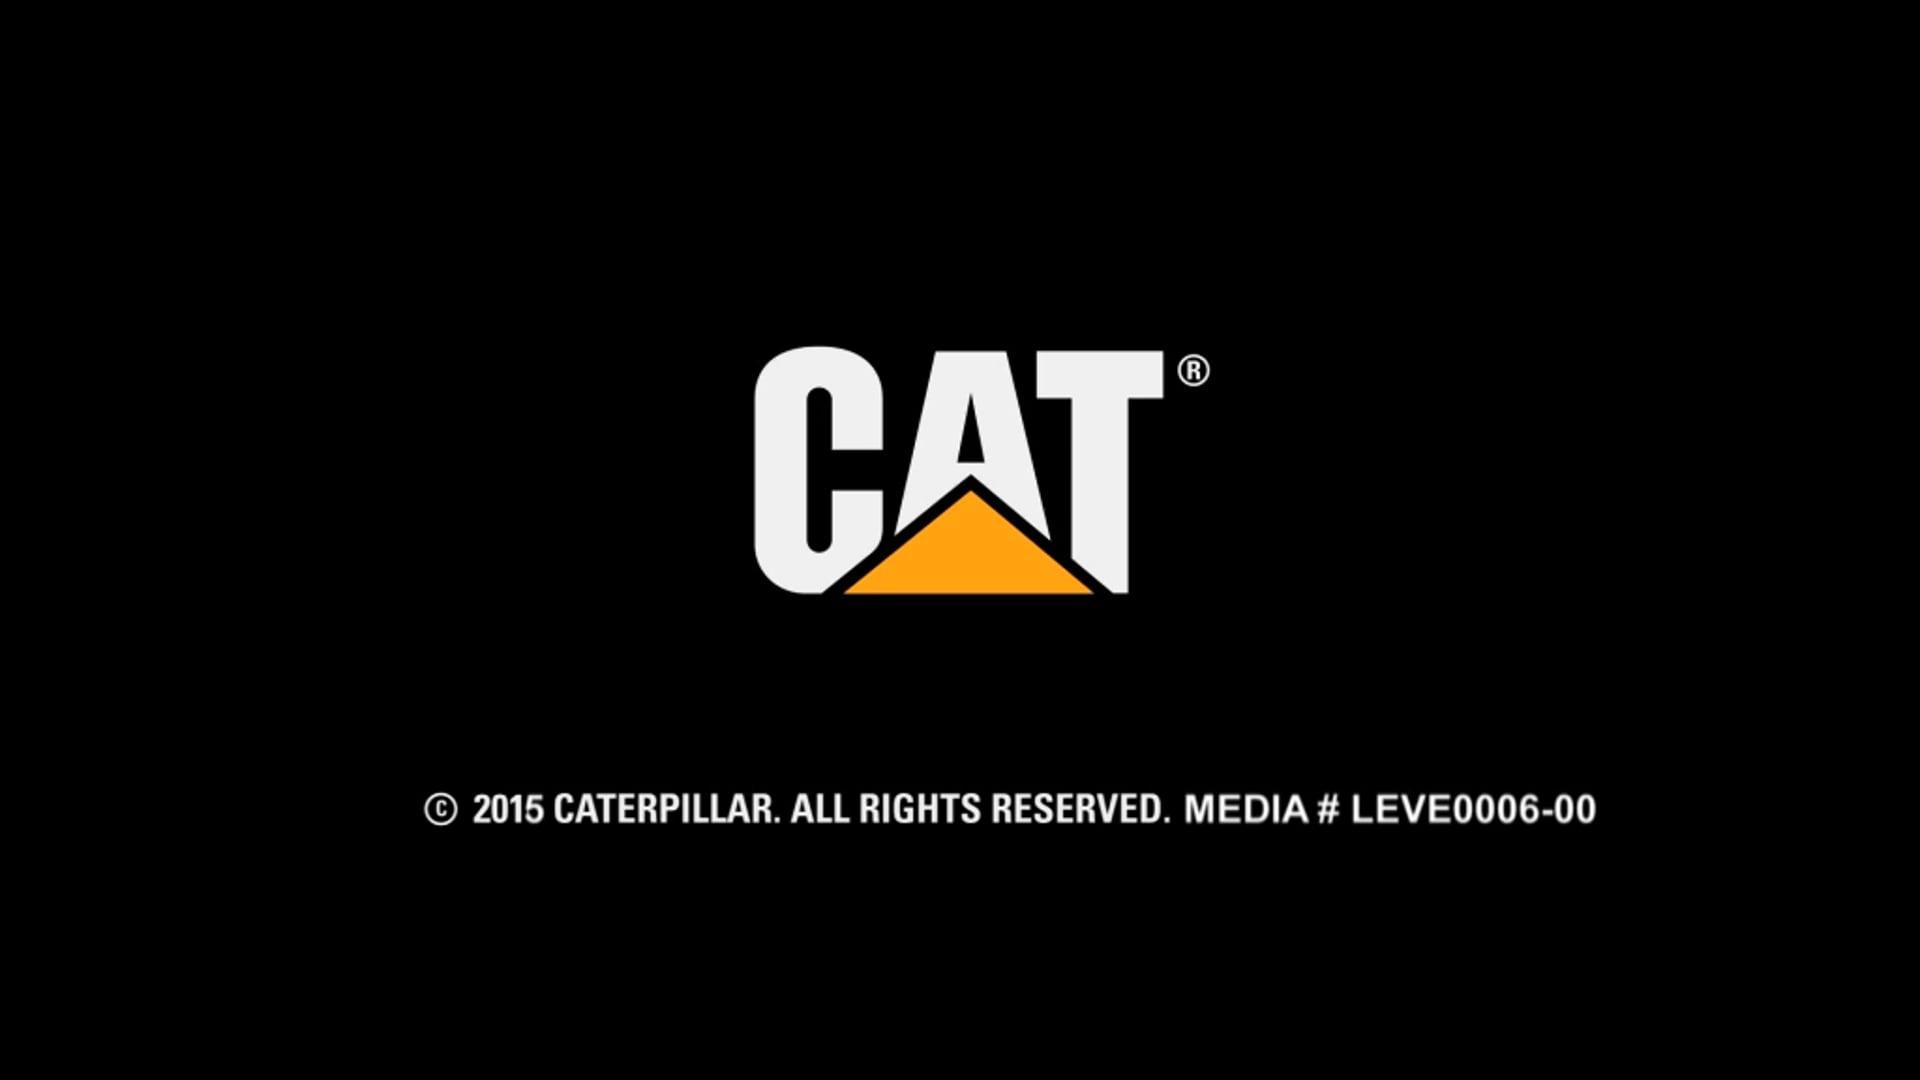 CATERPILLAR MARKETING VIDEO